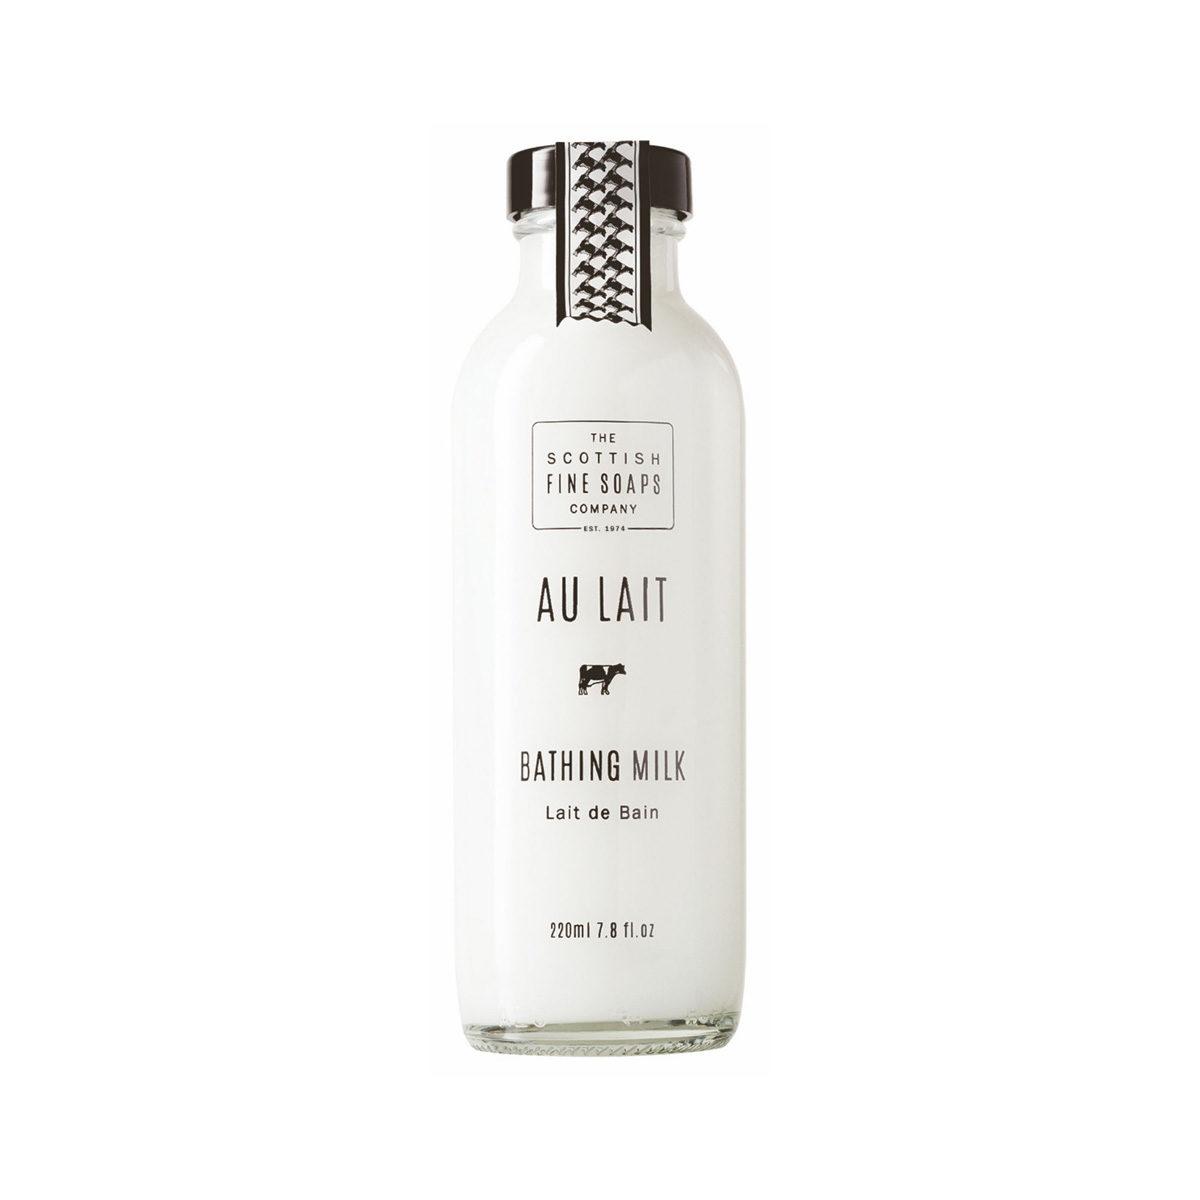 Au Lait Bathing Milk